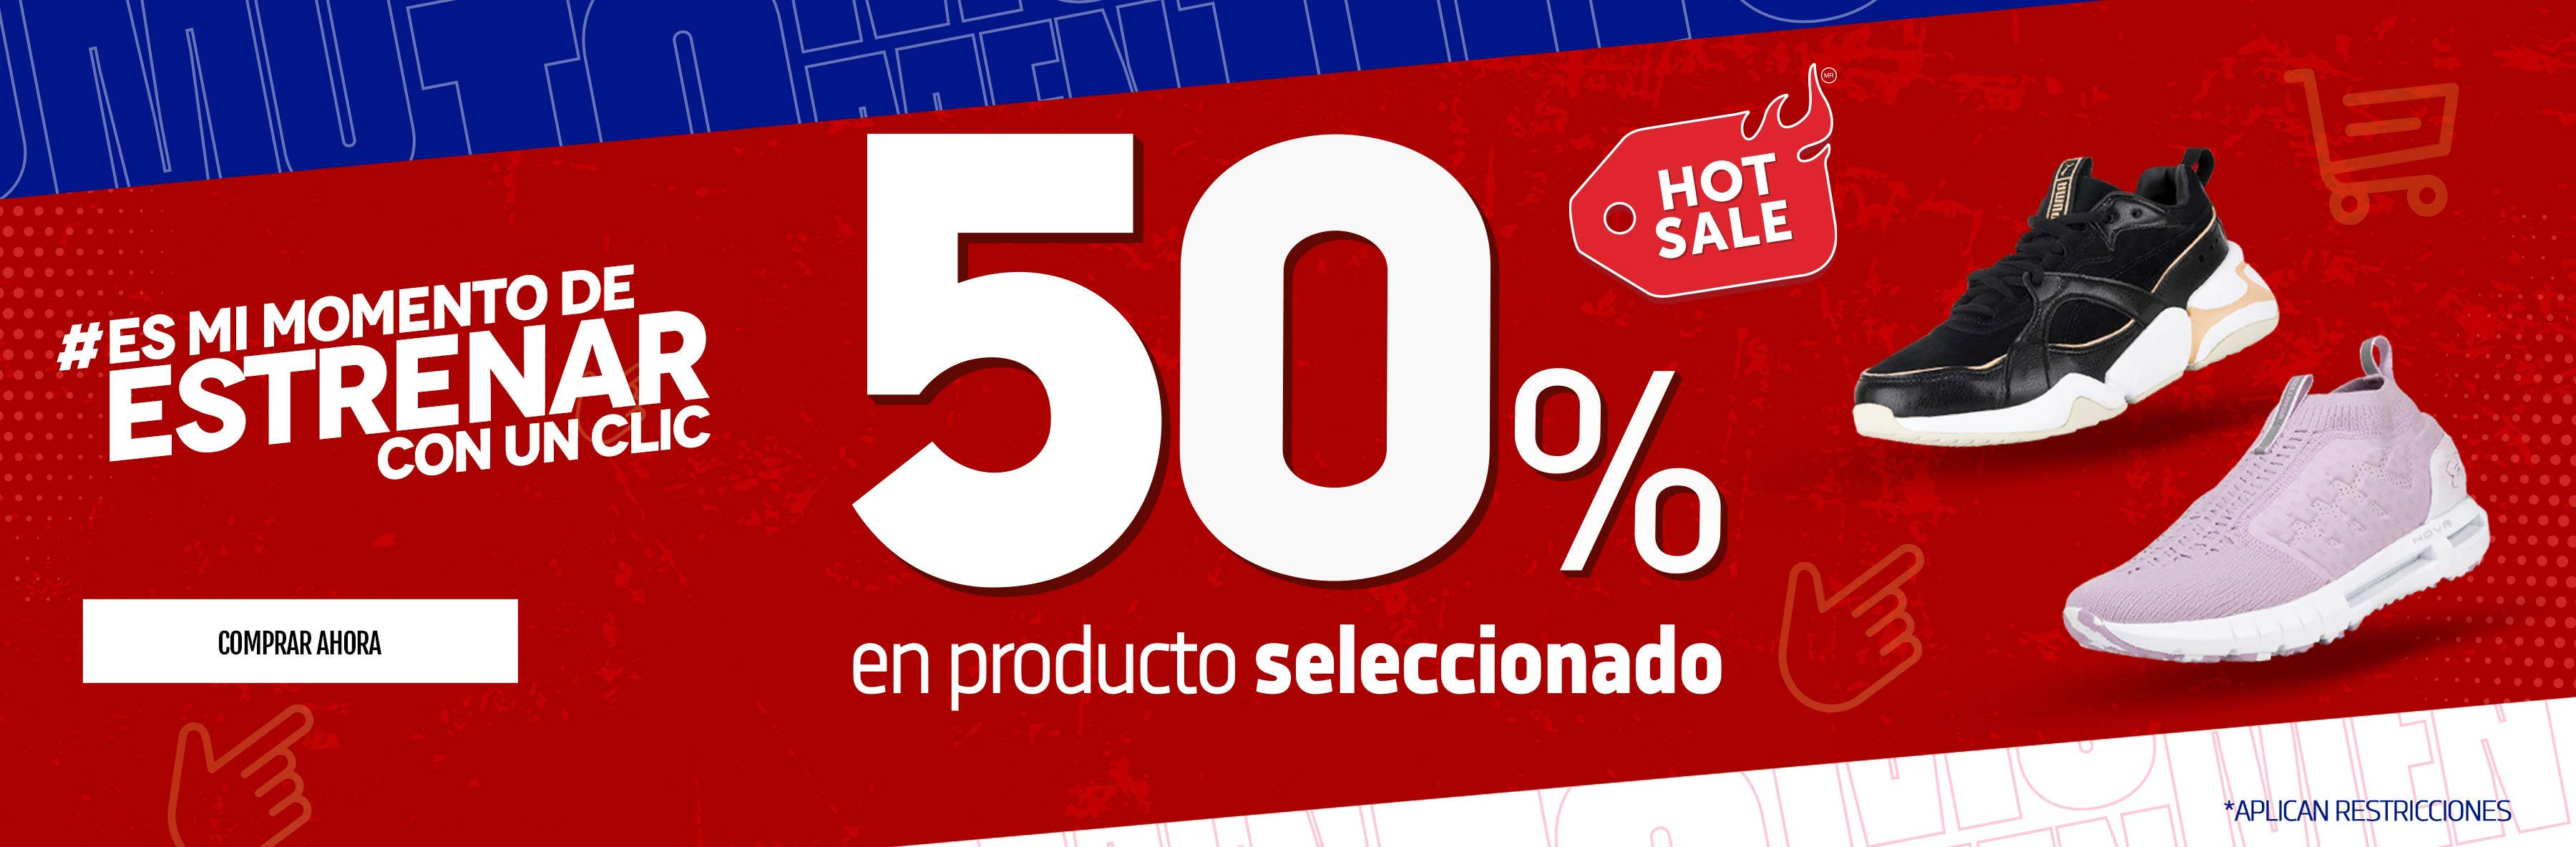 Banner producto 50% hotsale